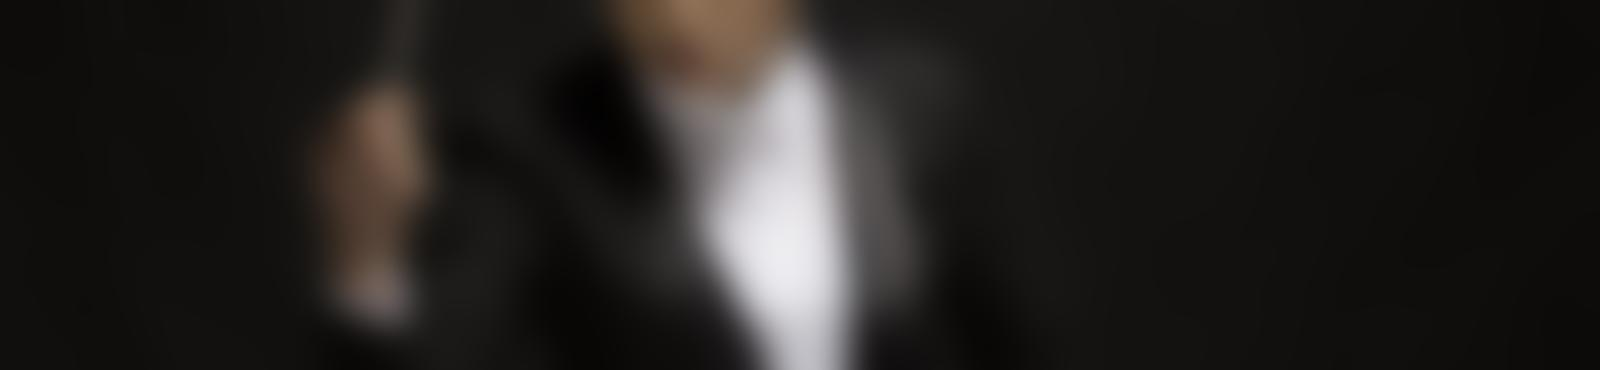 Blurred 07a663b8 417a 4c6b 9f16 6d95c0cd23ac